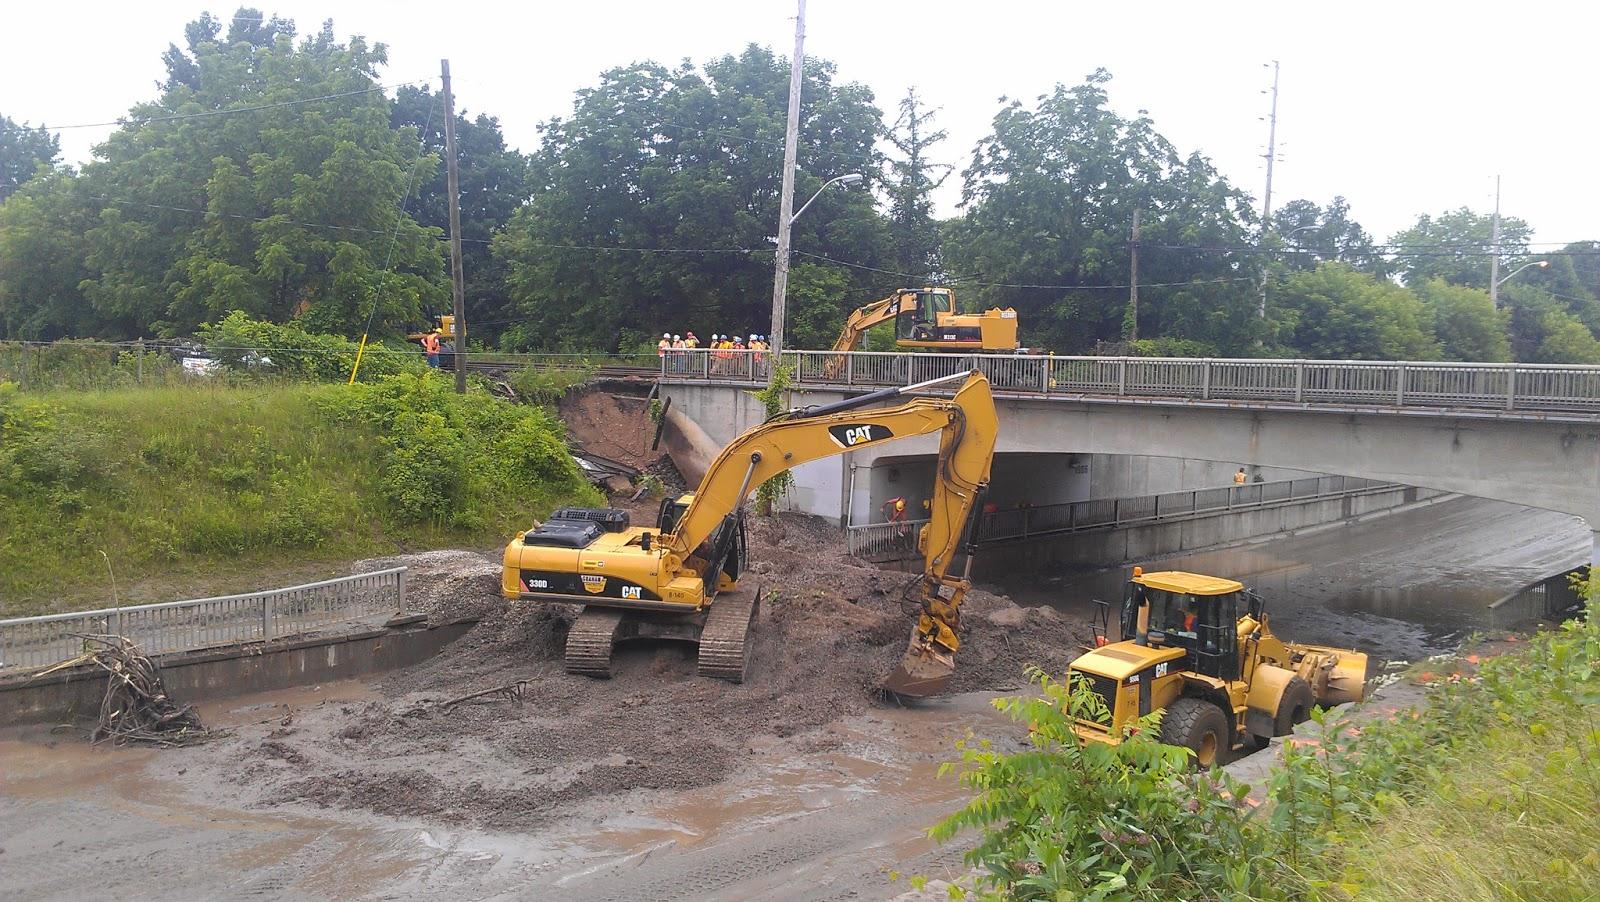 dixie road construction railway track toronto flood GO train port credit long branch